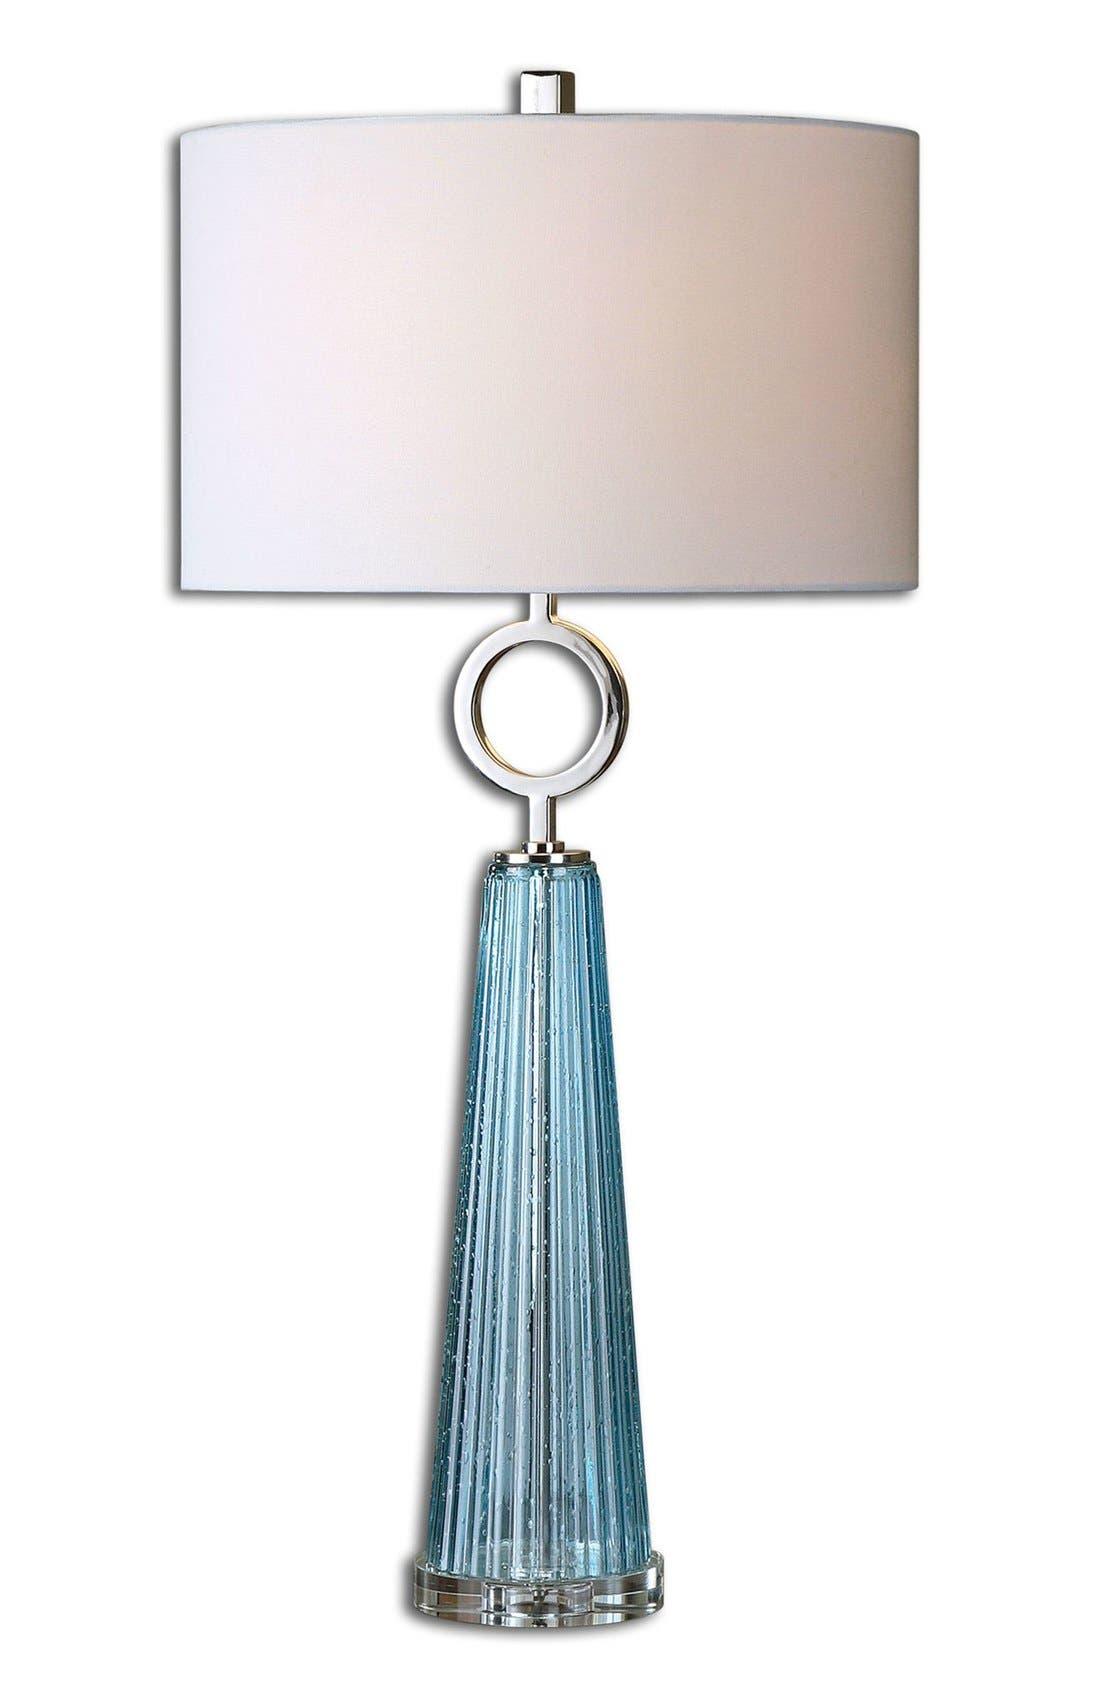 Alternate Image 1 Selected - Uttermost 'Navier' Seed Glass & Metallic Table Lamp